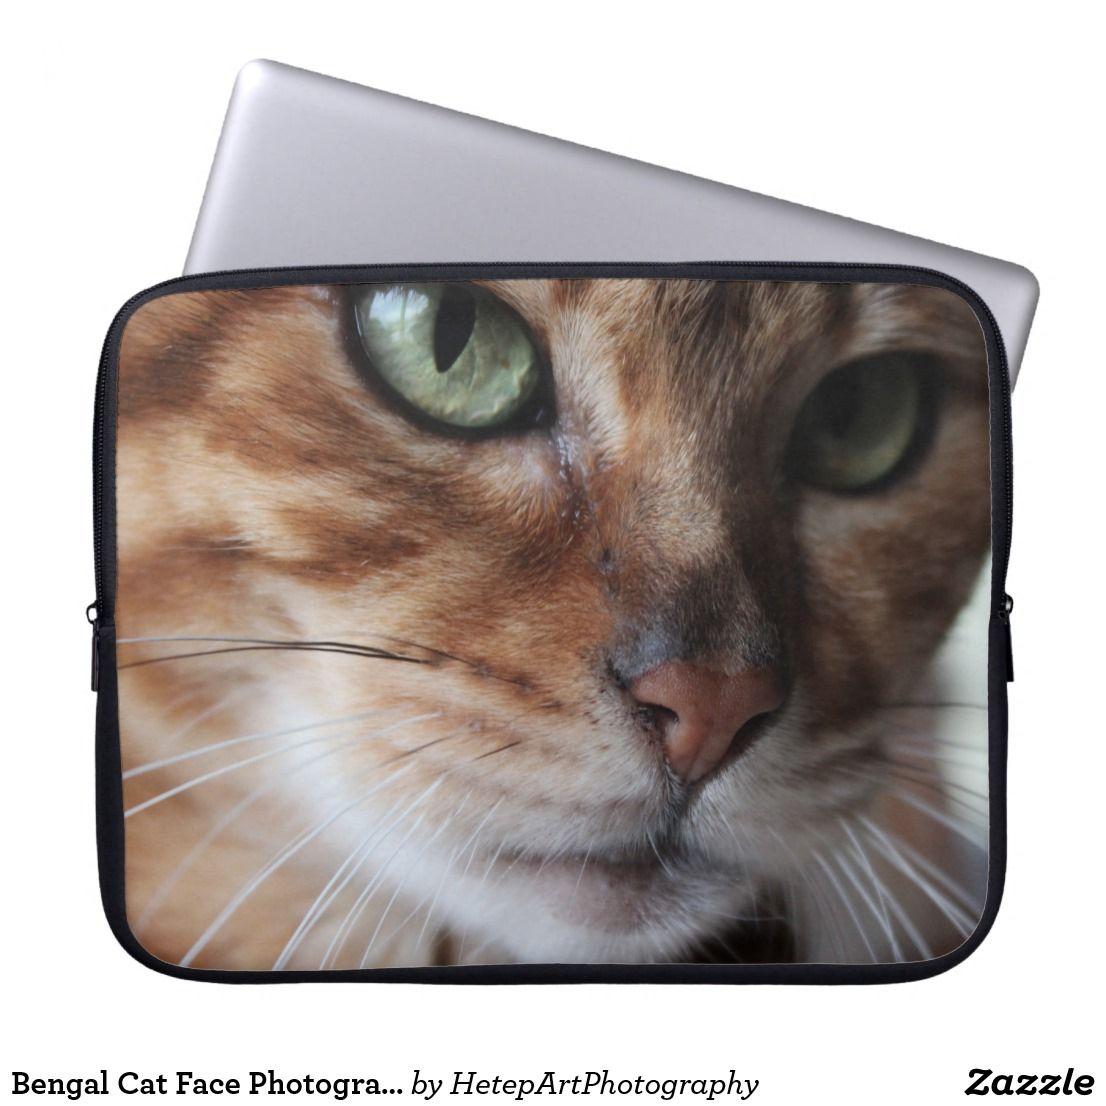 Bengal Cat Face Photograph, Add Your Own Meme Laptop